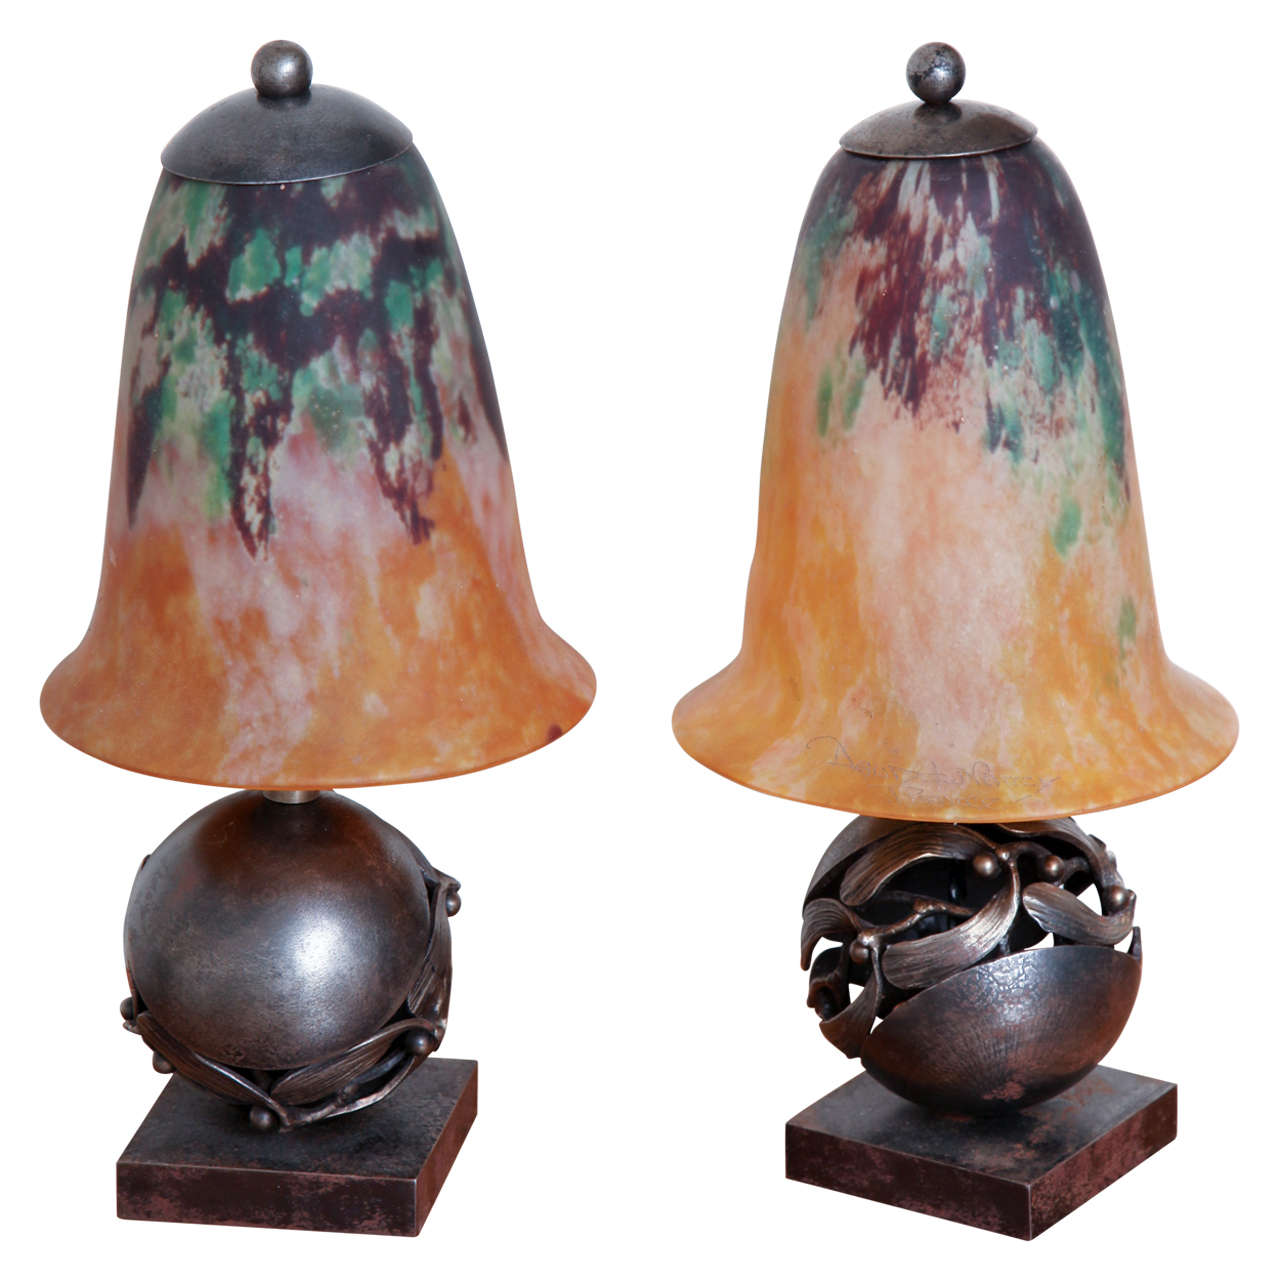 Pair of edgar brandt and daum art deco table lamps for sale at 1stdibs pair of edgar brandt daum art deco table lamps 1 geotapseo Images